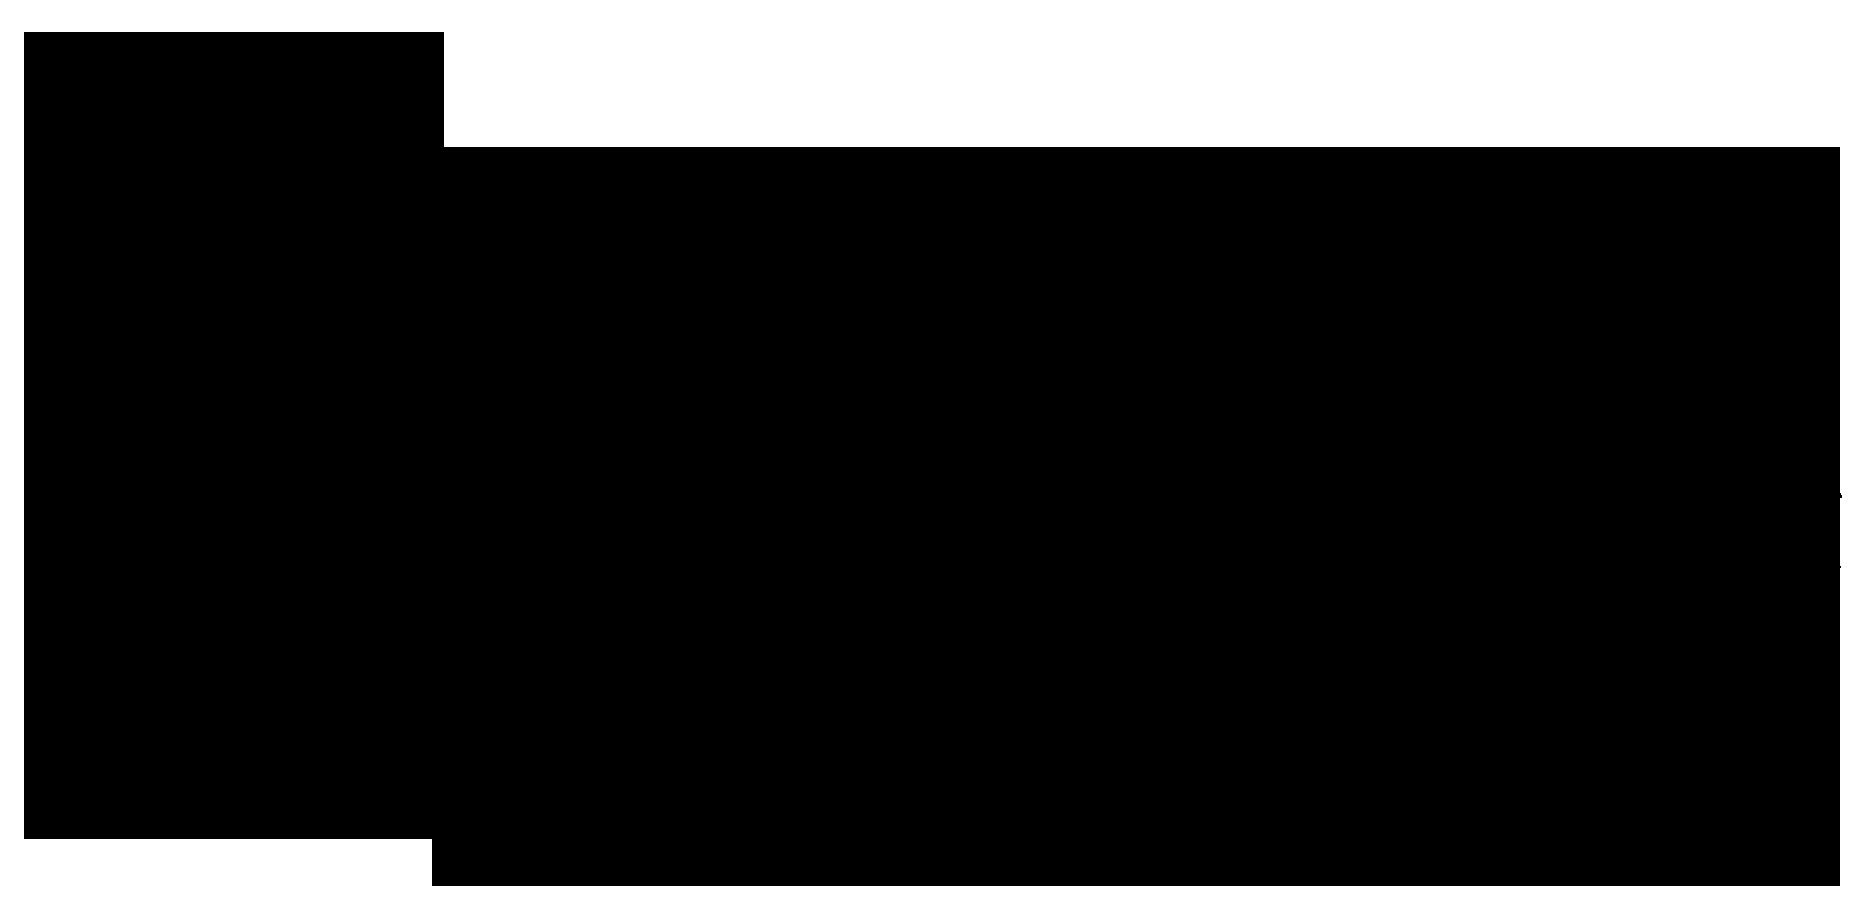 datasurvey-logo-black